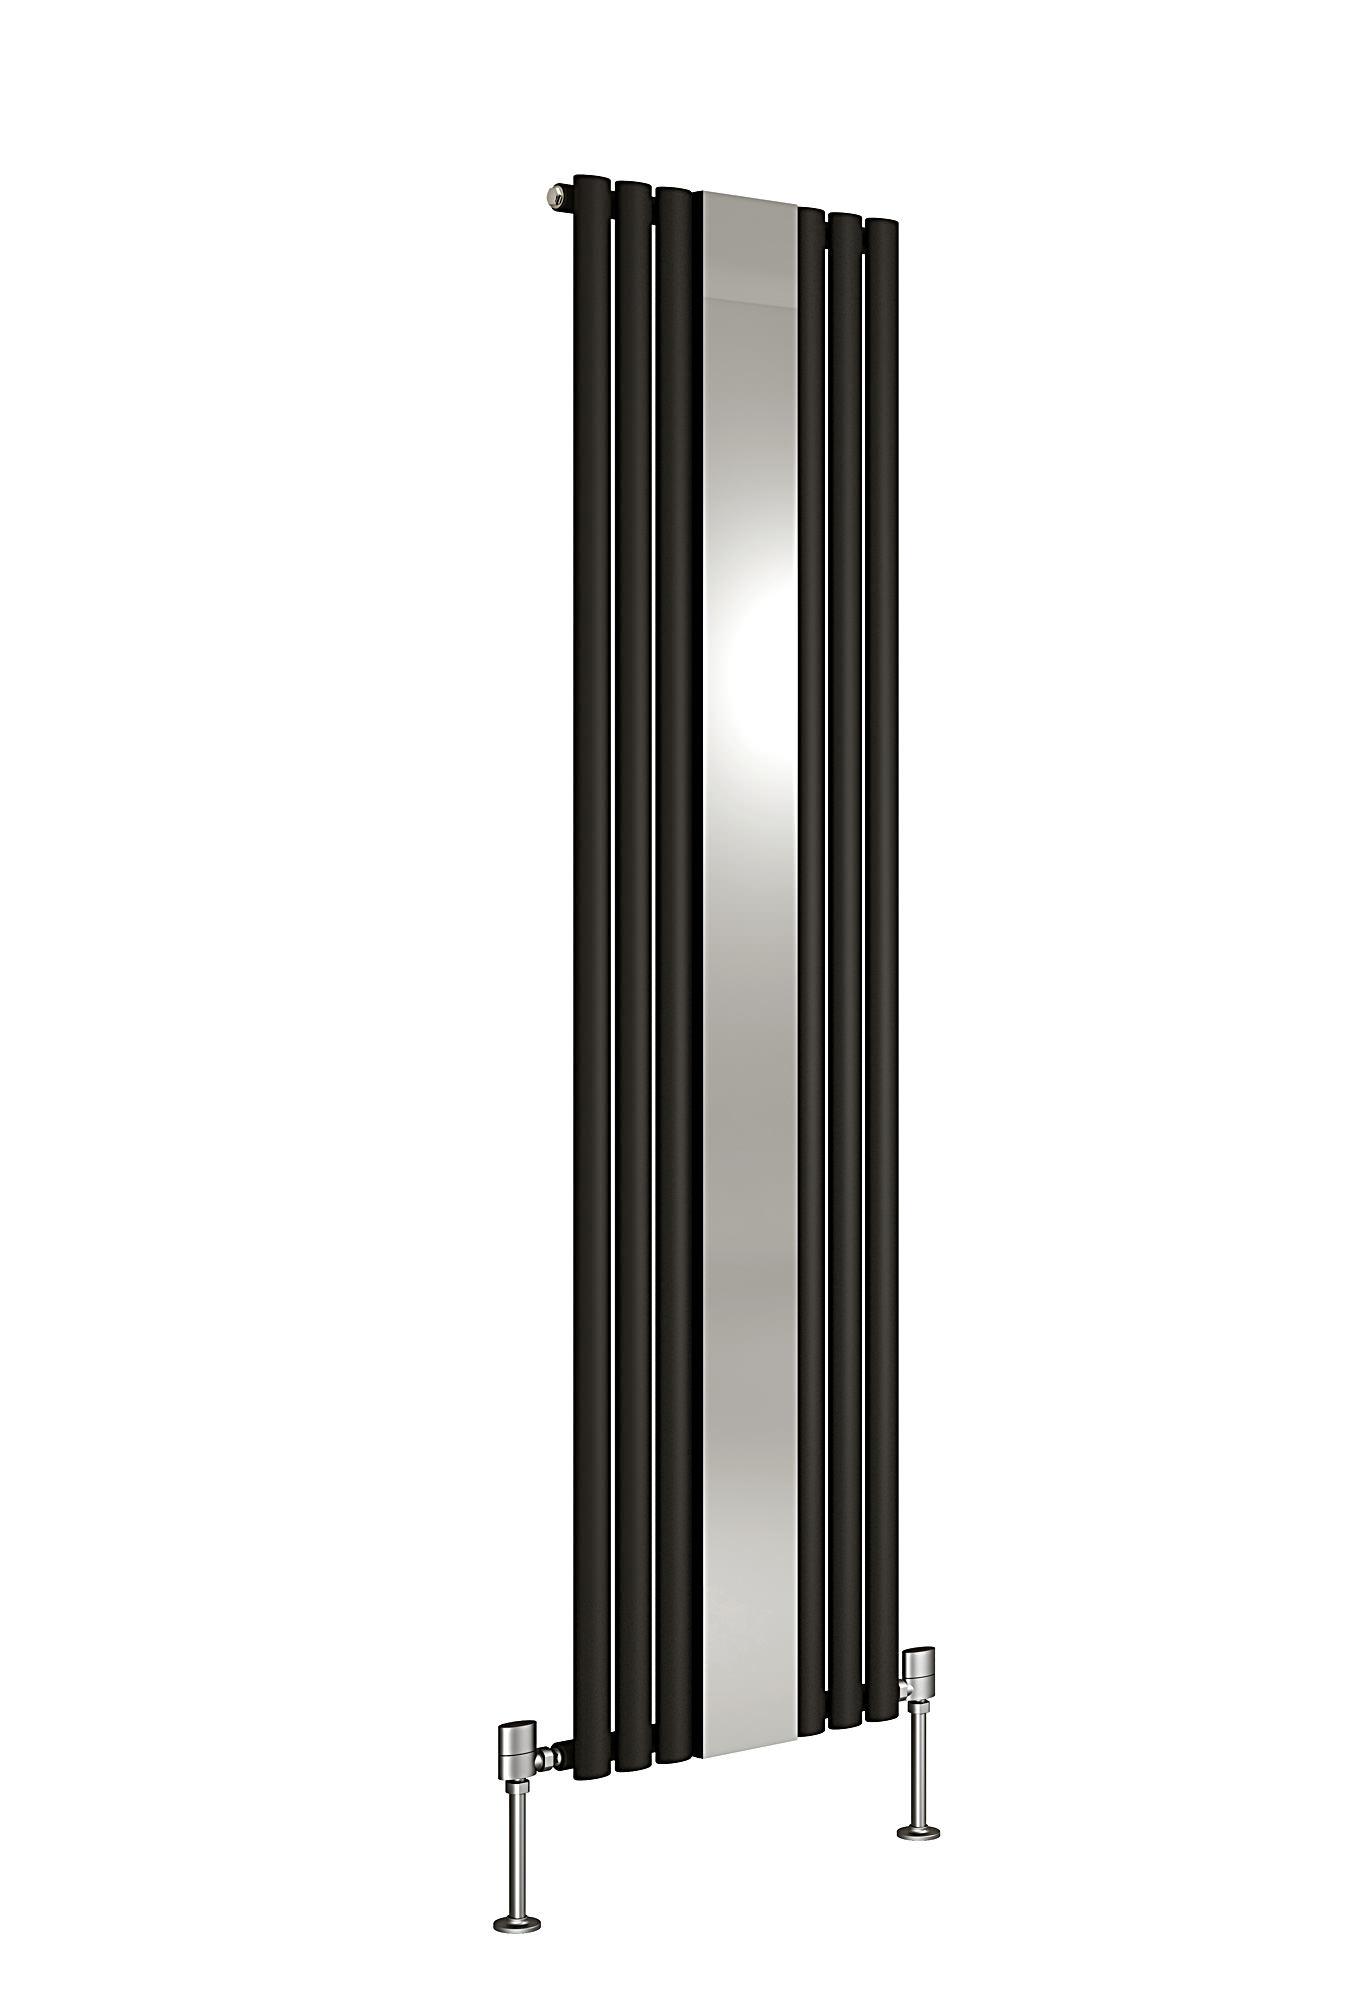 Dq heating cove mirror designer radiator 500 x 1800mm black for Mirror radiator